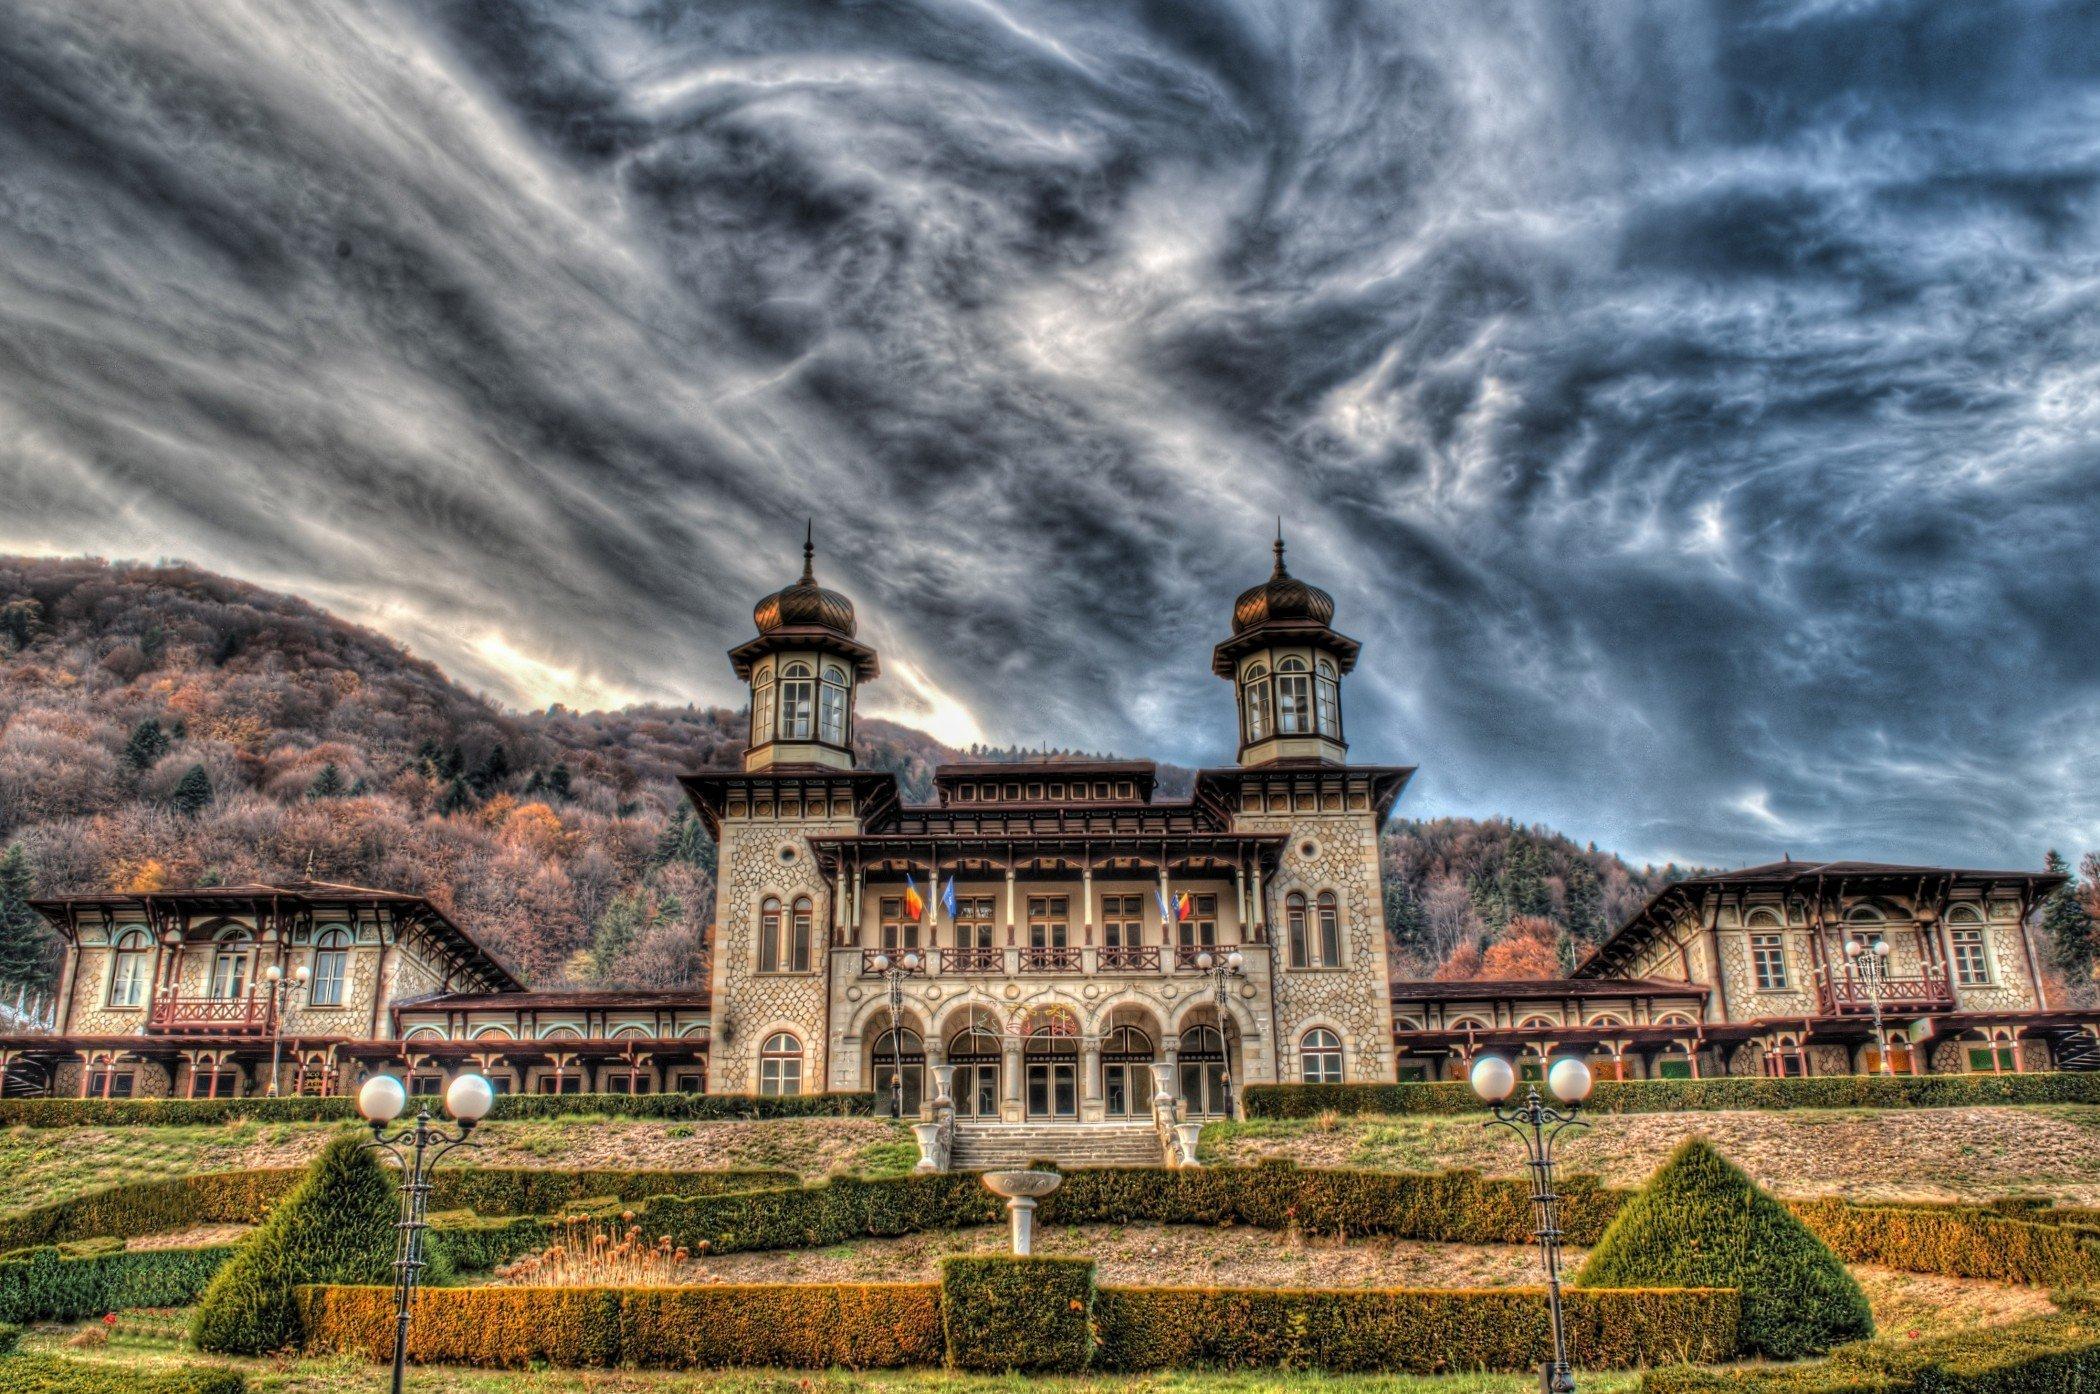 Obiective turistice SLANIC MOLDOVA: 15 Locuri de vizitat ...